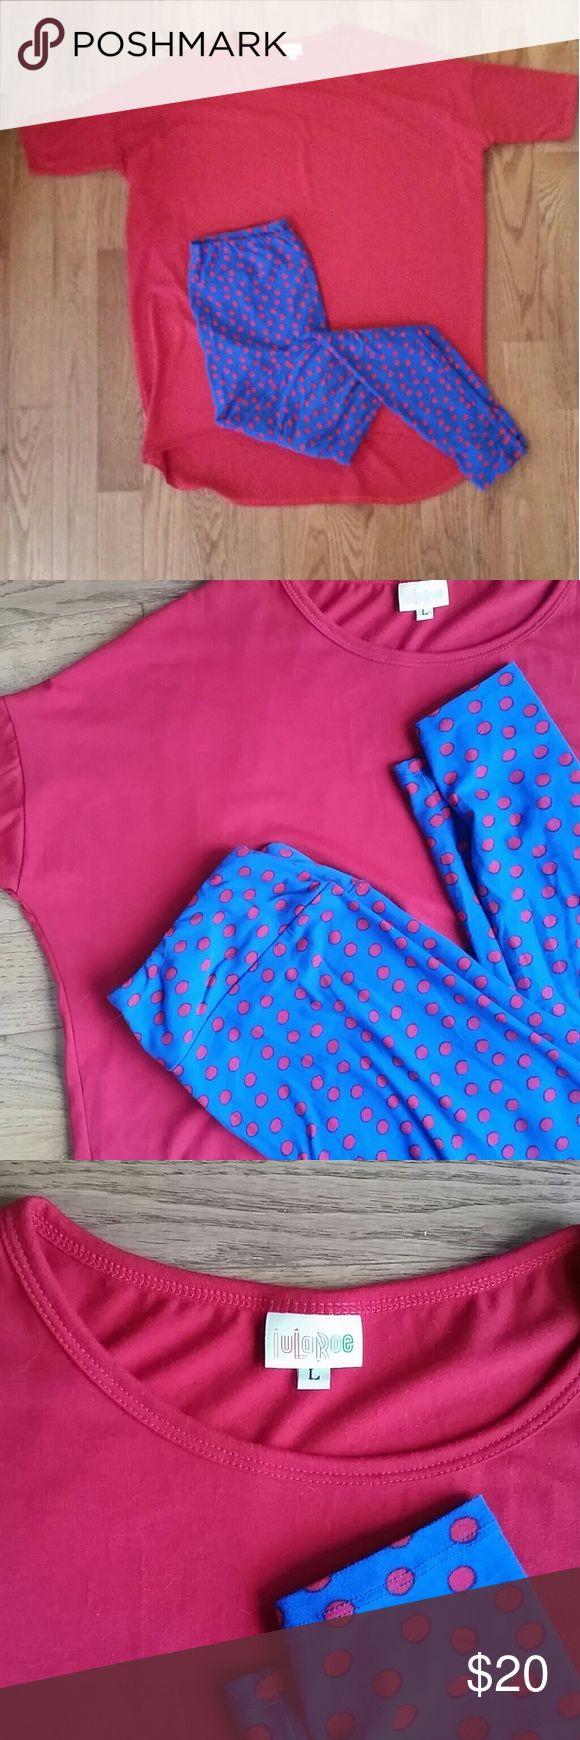 Lularoe tall curvy leggings blue and red polka dot Lularoe leggings are so super comfortable. These are the tall curvy leggings. Royal blue color with true red polka dots. LuLaRoe Pants Leggings